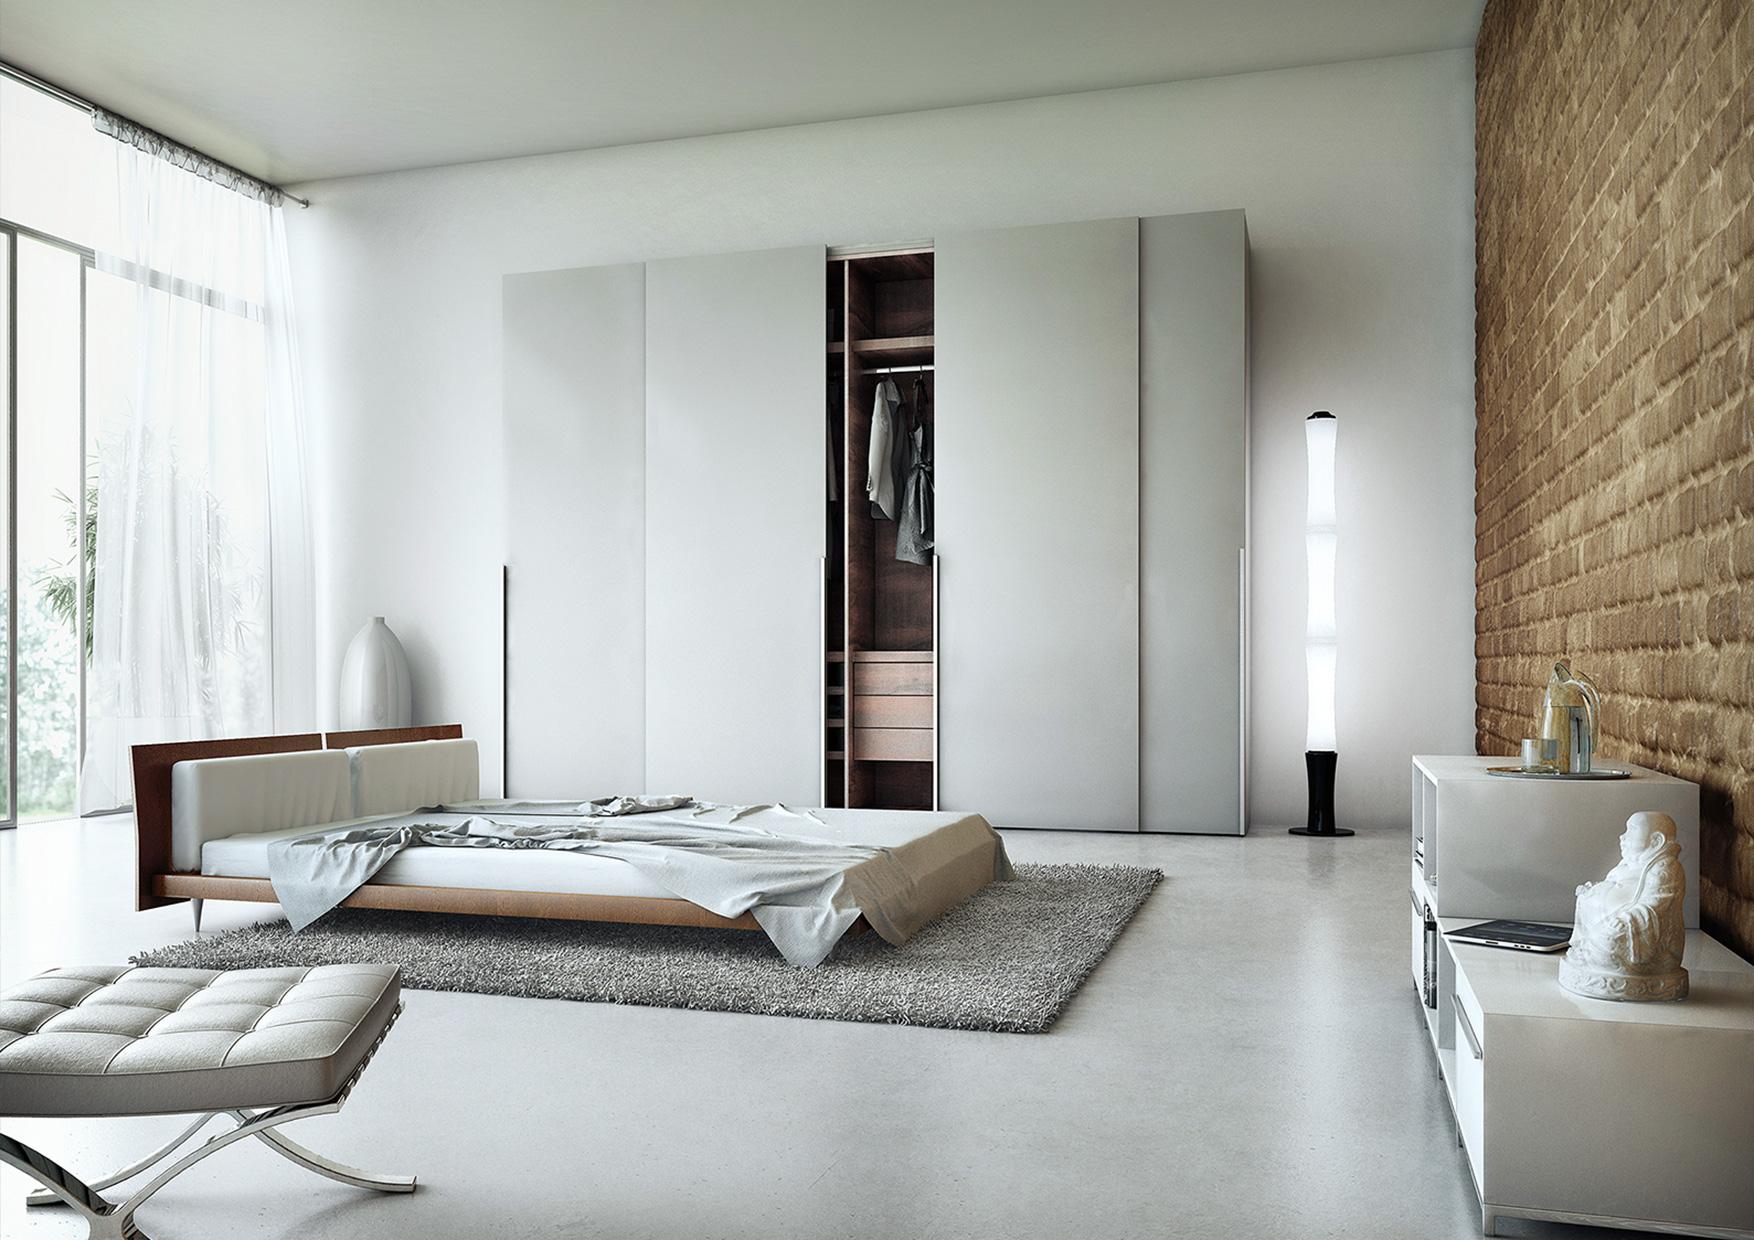 CGI Rendering 3d Beton Concrete Apartment Interior Schlafzimmer Idris Kolodziej